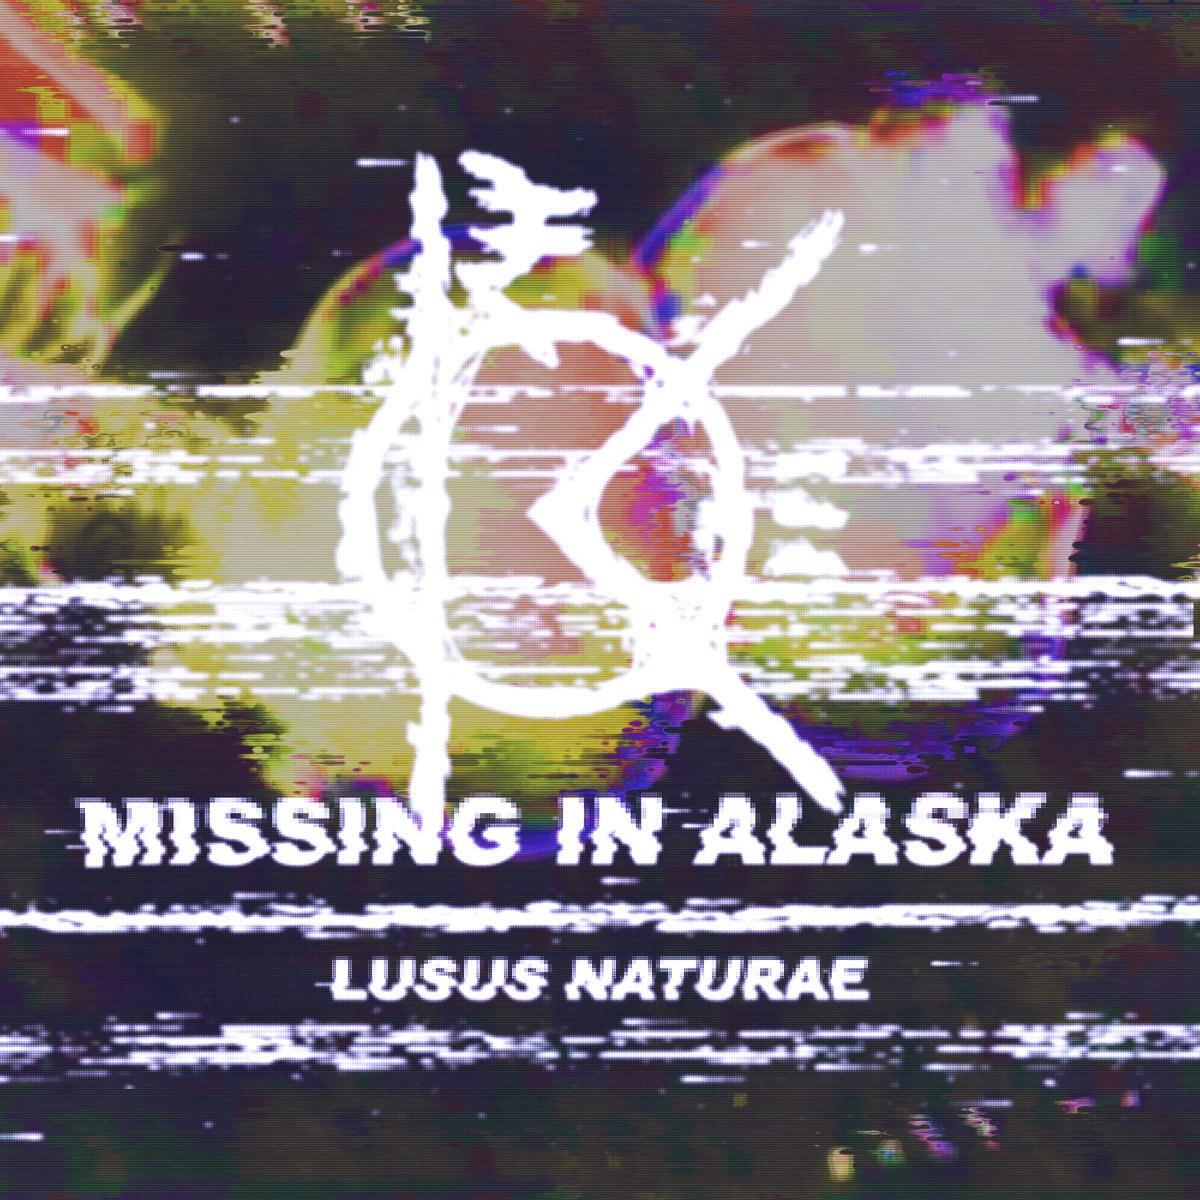 Missing in Alaska - Lusus Naturae [Single] (2016)